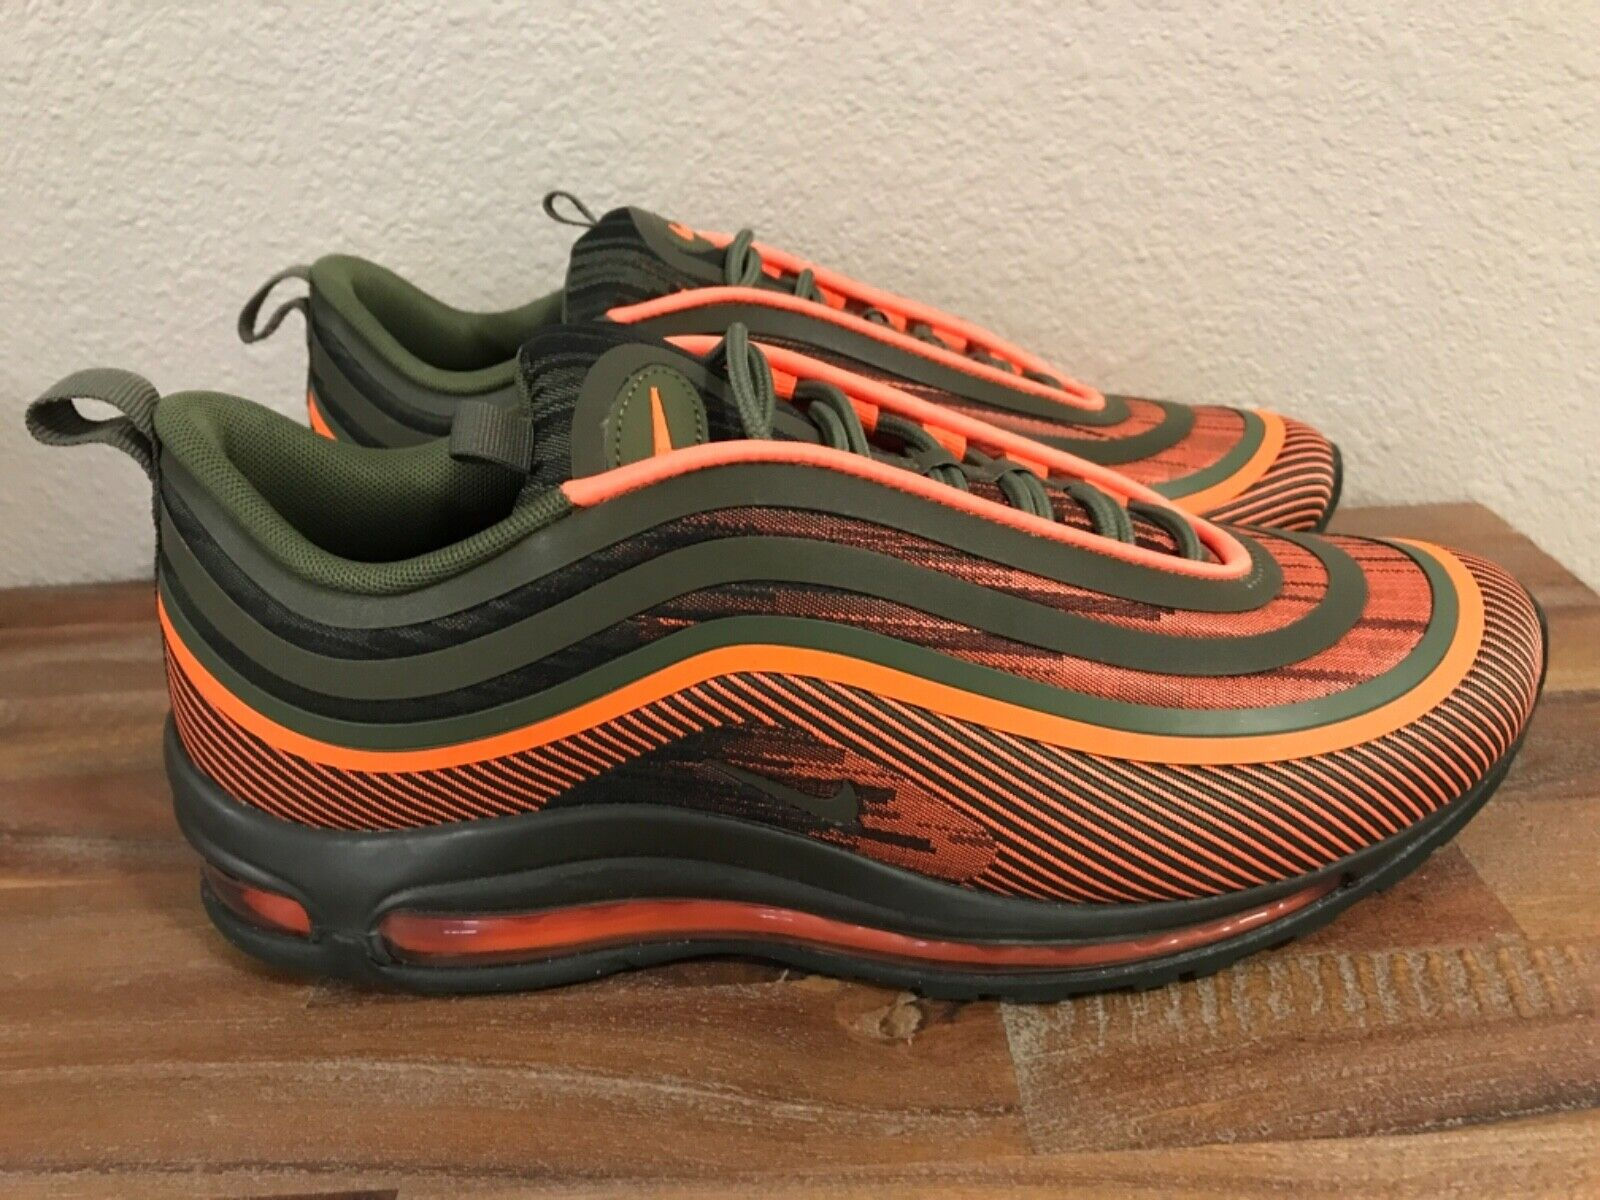 Nike Air Max 97 Ultra '17 arancia totali   Olive Running scarpe 918356 -801 Men Sz 10  marchio in liquidazione